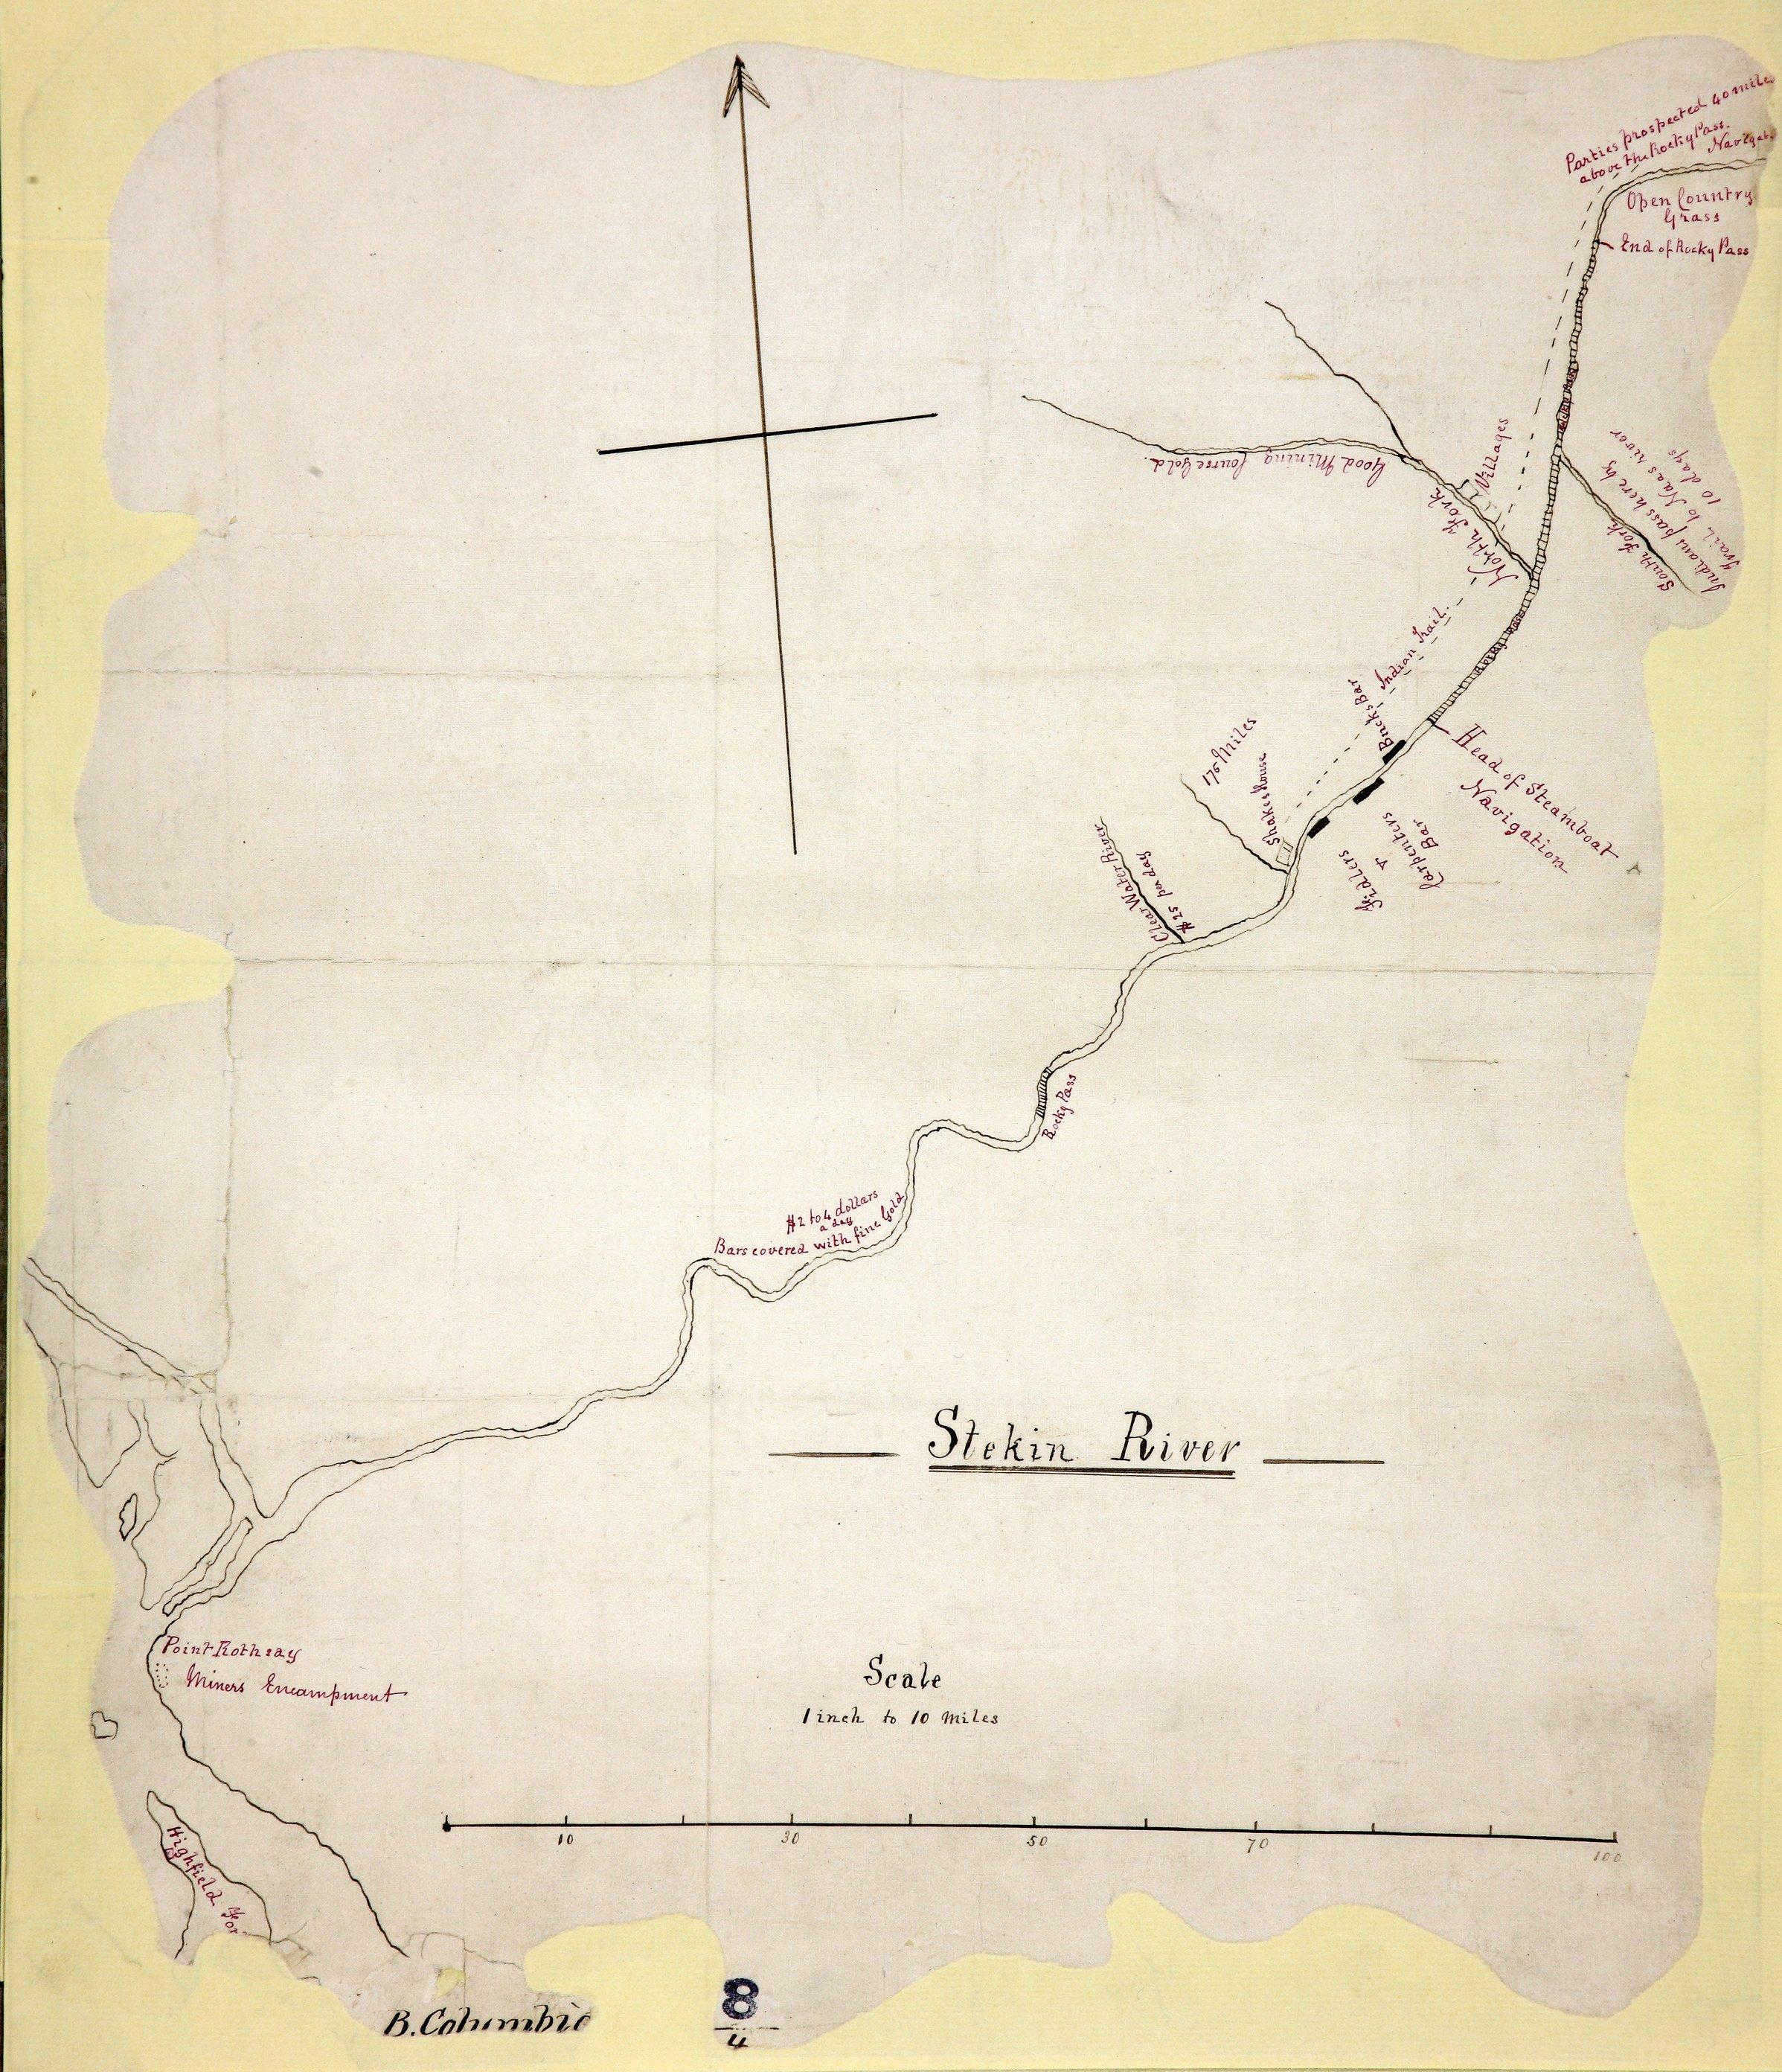 Stekin River [c. 1860]